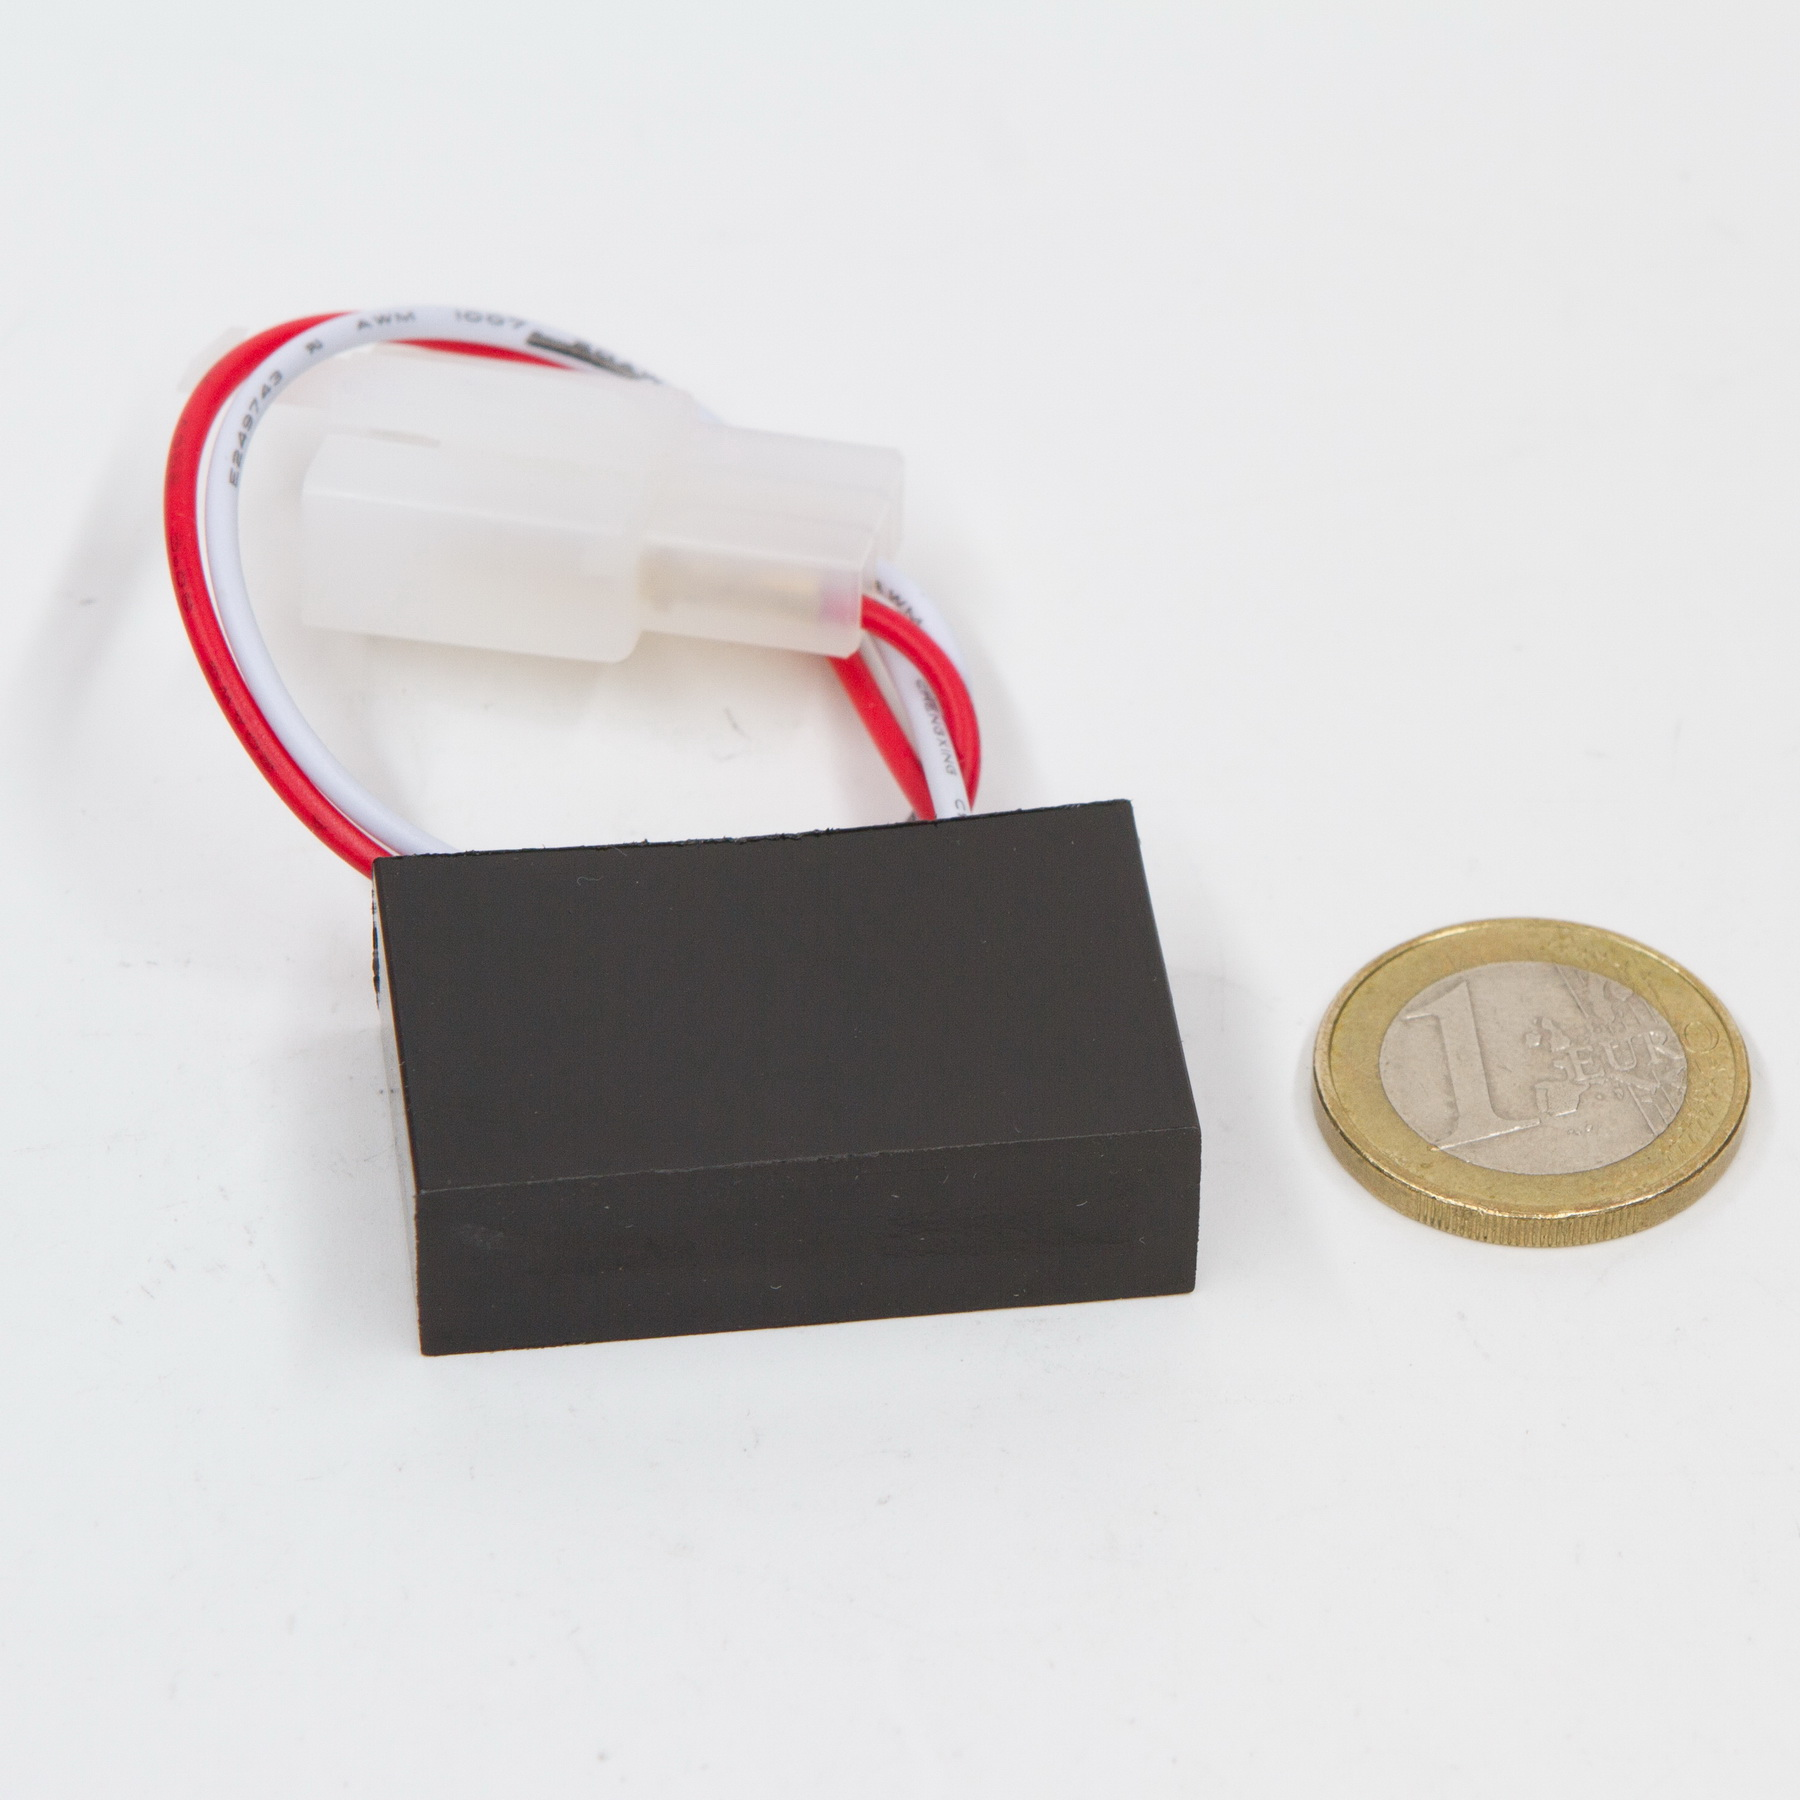 motorrad led blinkgeber led relais 3 polig 2 polig relai. Black Bedroom Furniture Sets. Home Design Ideas